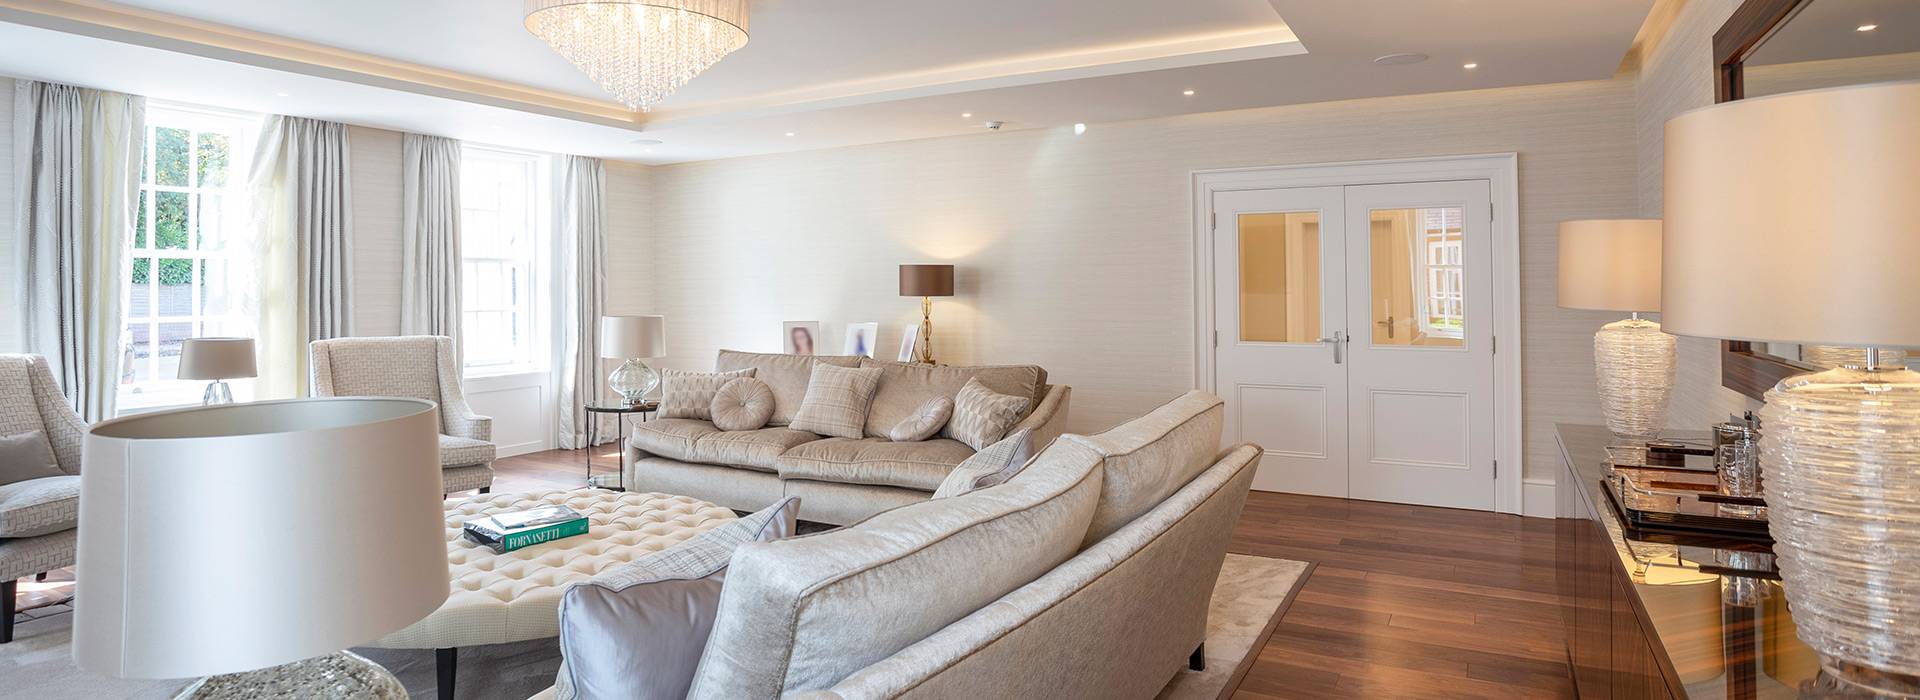 Luxury interior double doors